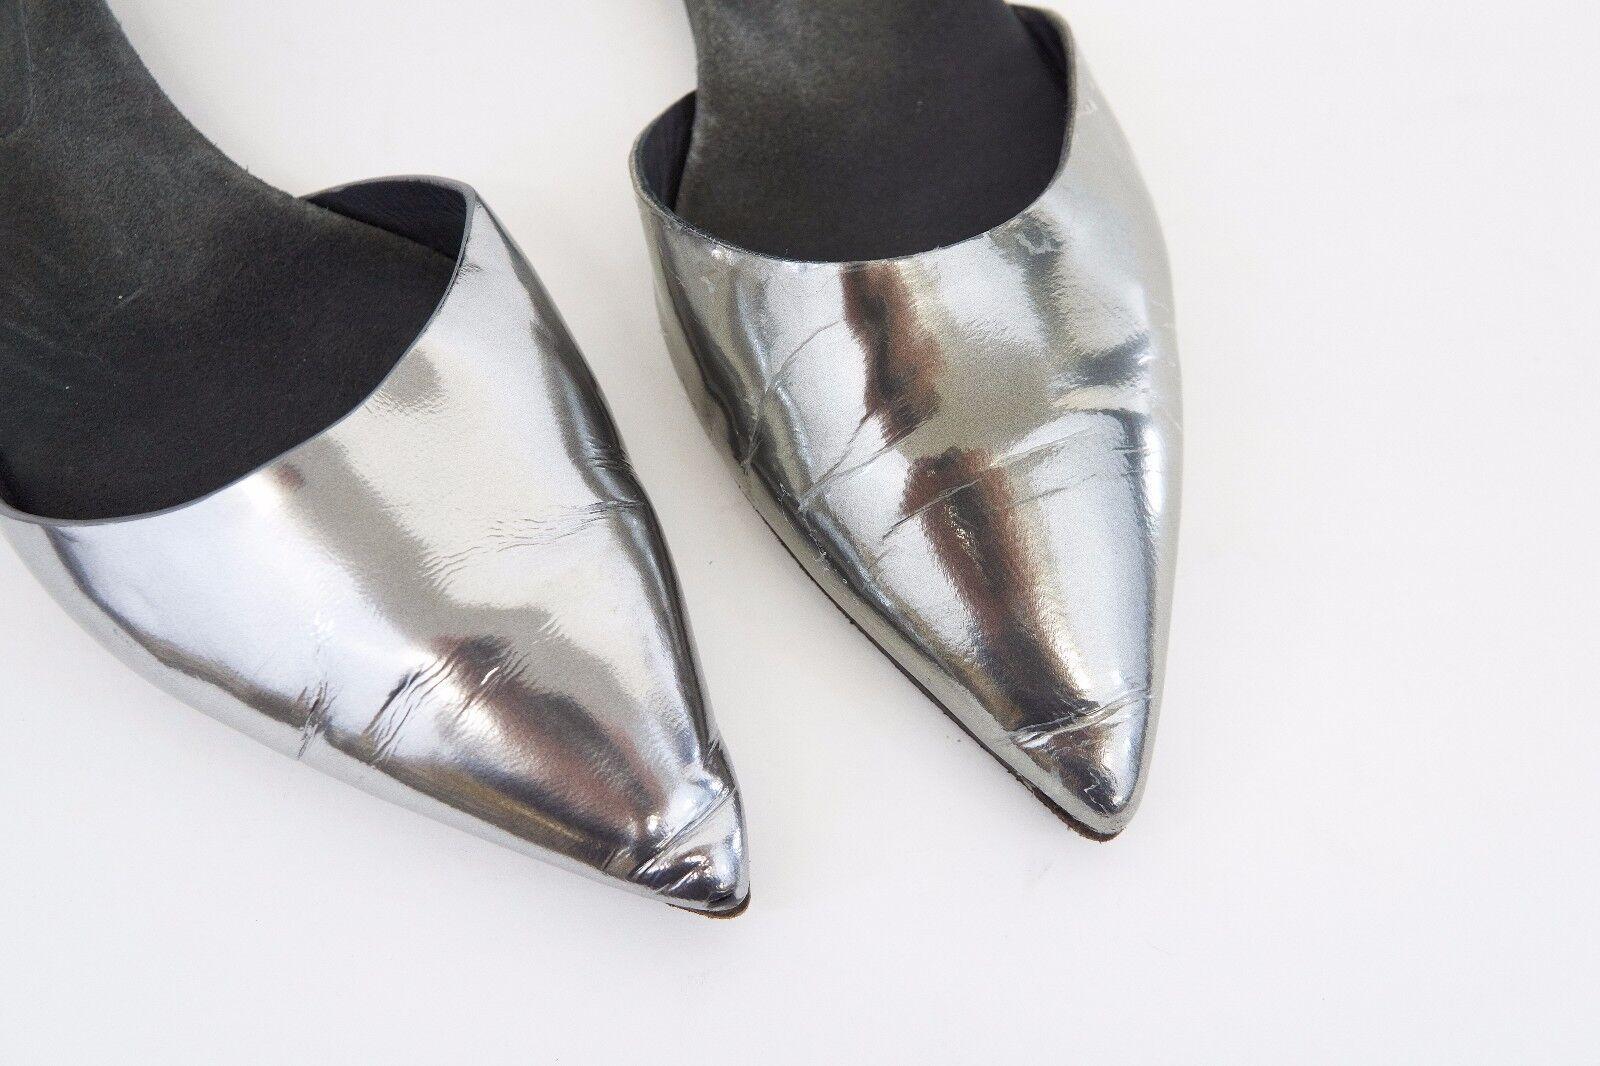 Brunello Cucinelli 40/10 2-Tone Leder Monili Ankle Beaded Flats Größe 40/10 Cucinelli US A176 ba2972